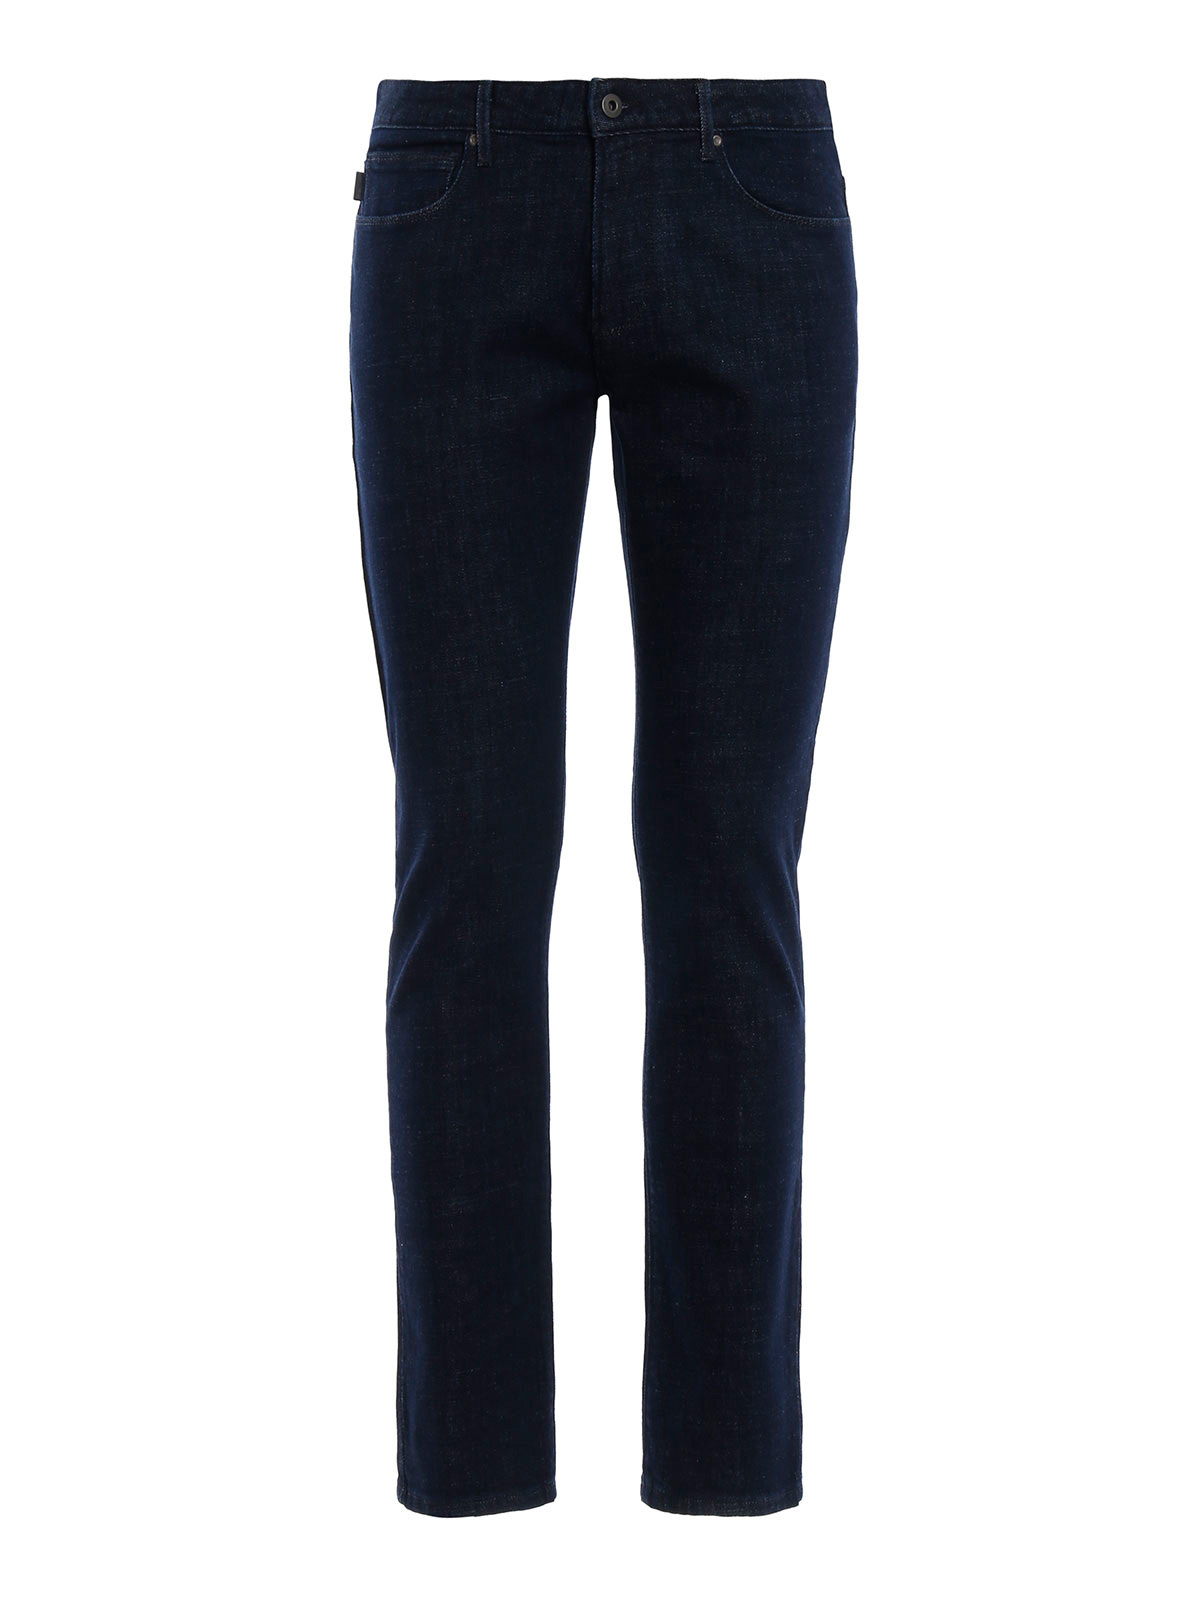 Picture of EMPORIO ARMANI | Men's Slim Fit Jeans J06